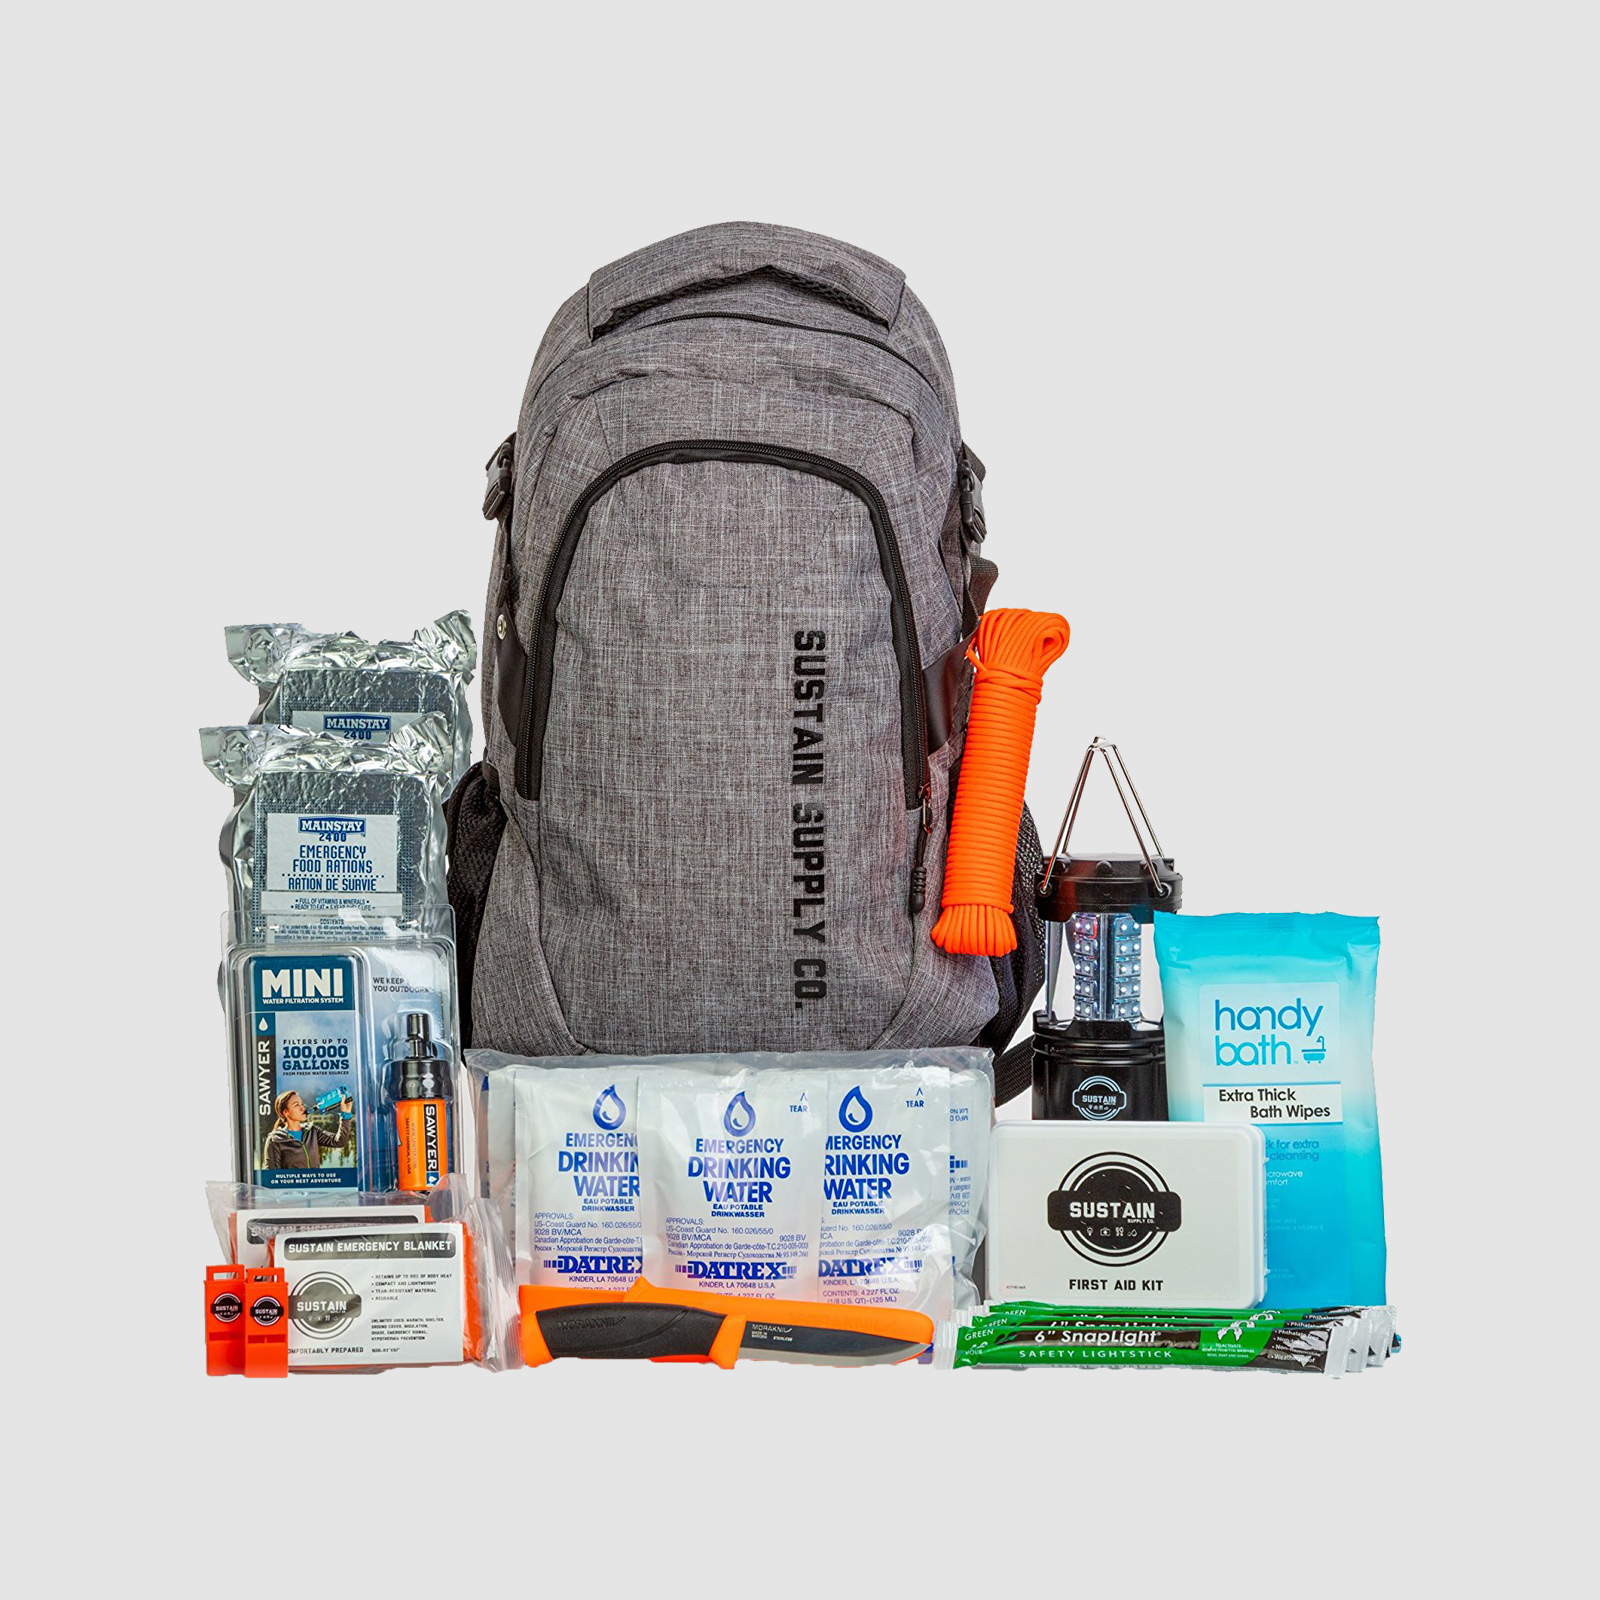 Sustain Supply Co. Essential Survival Kit | $89 | Amazon